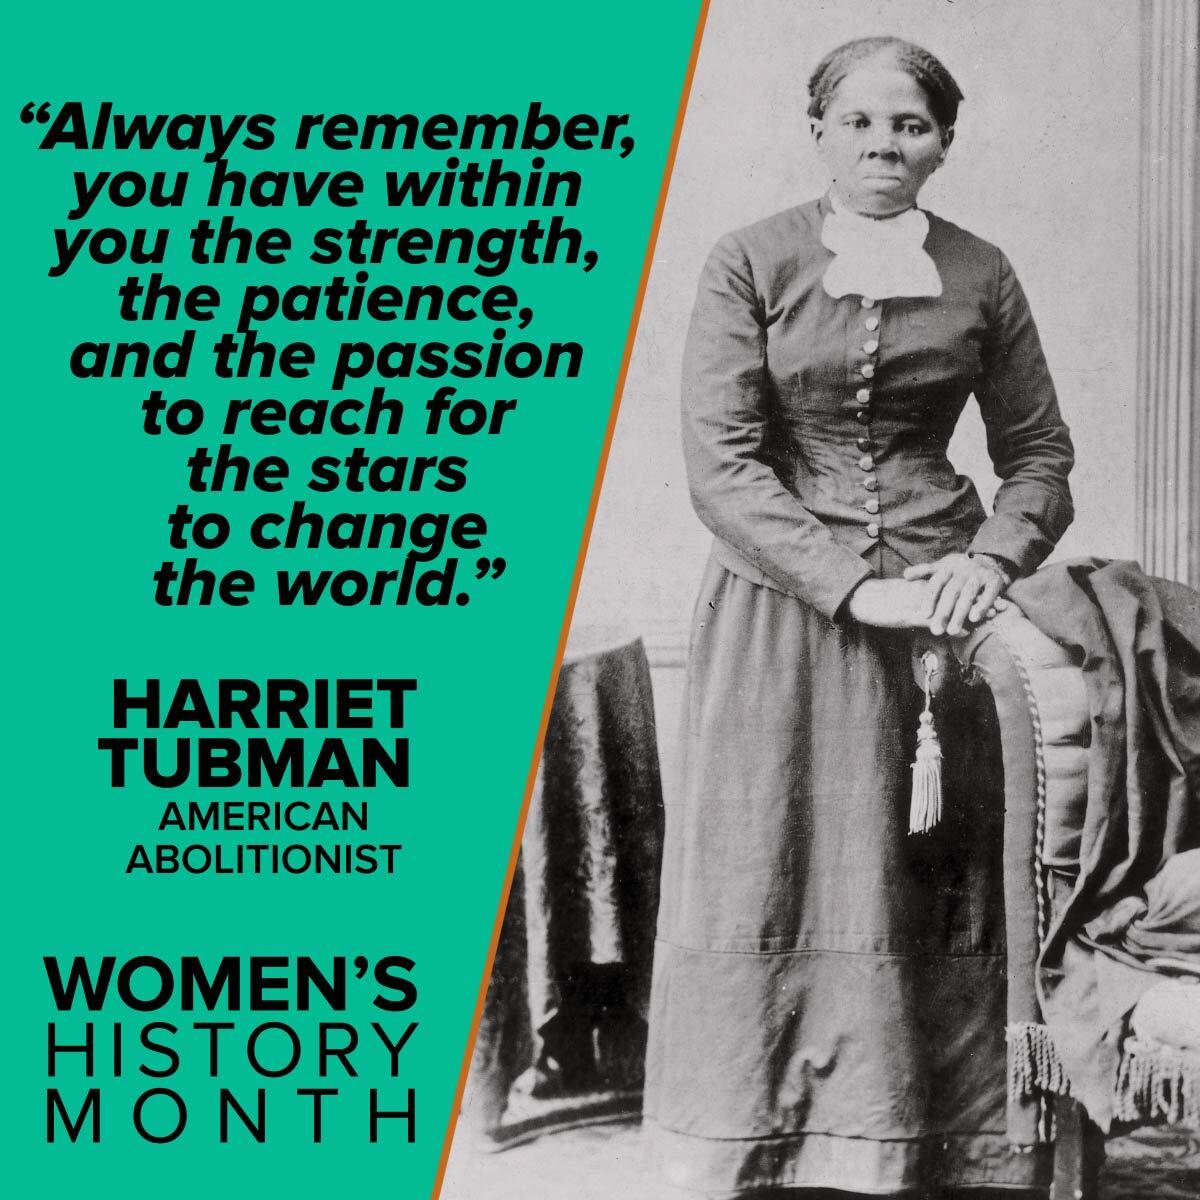 Women's History Month_Harriet Tubman.jpg